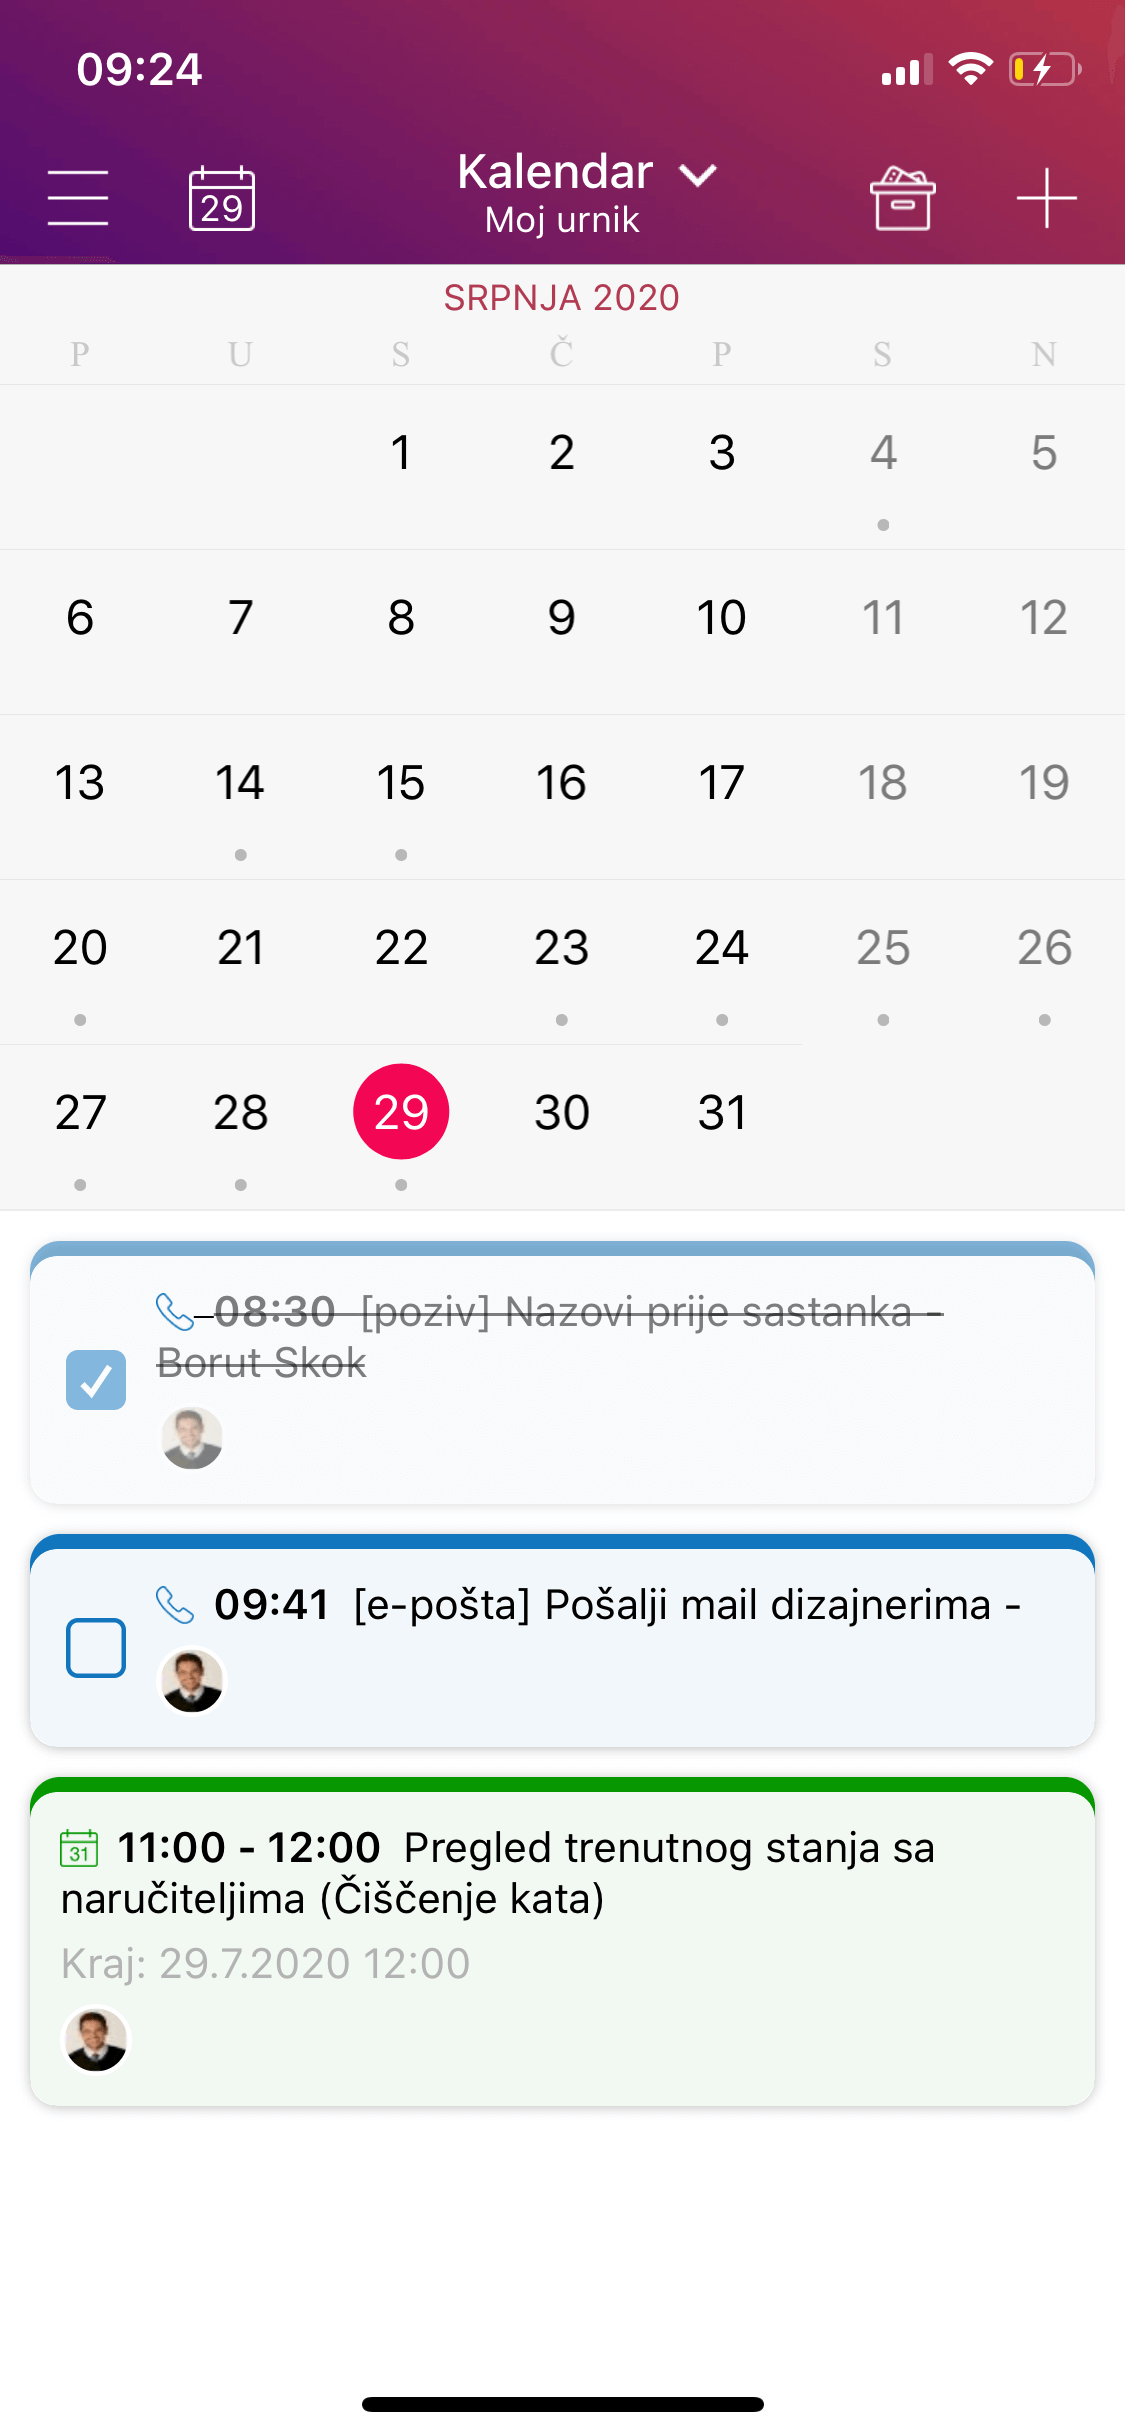 crm calendar